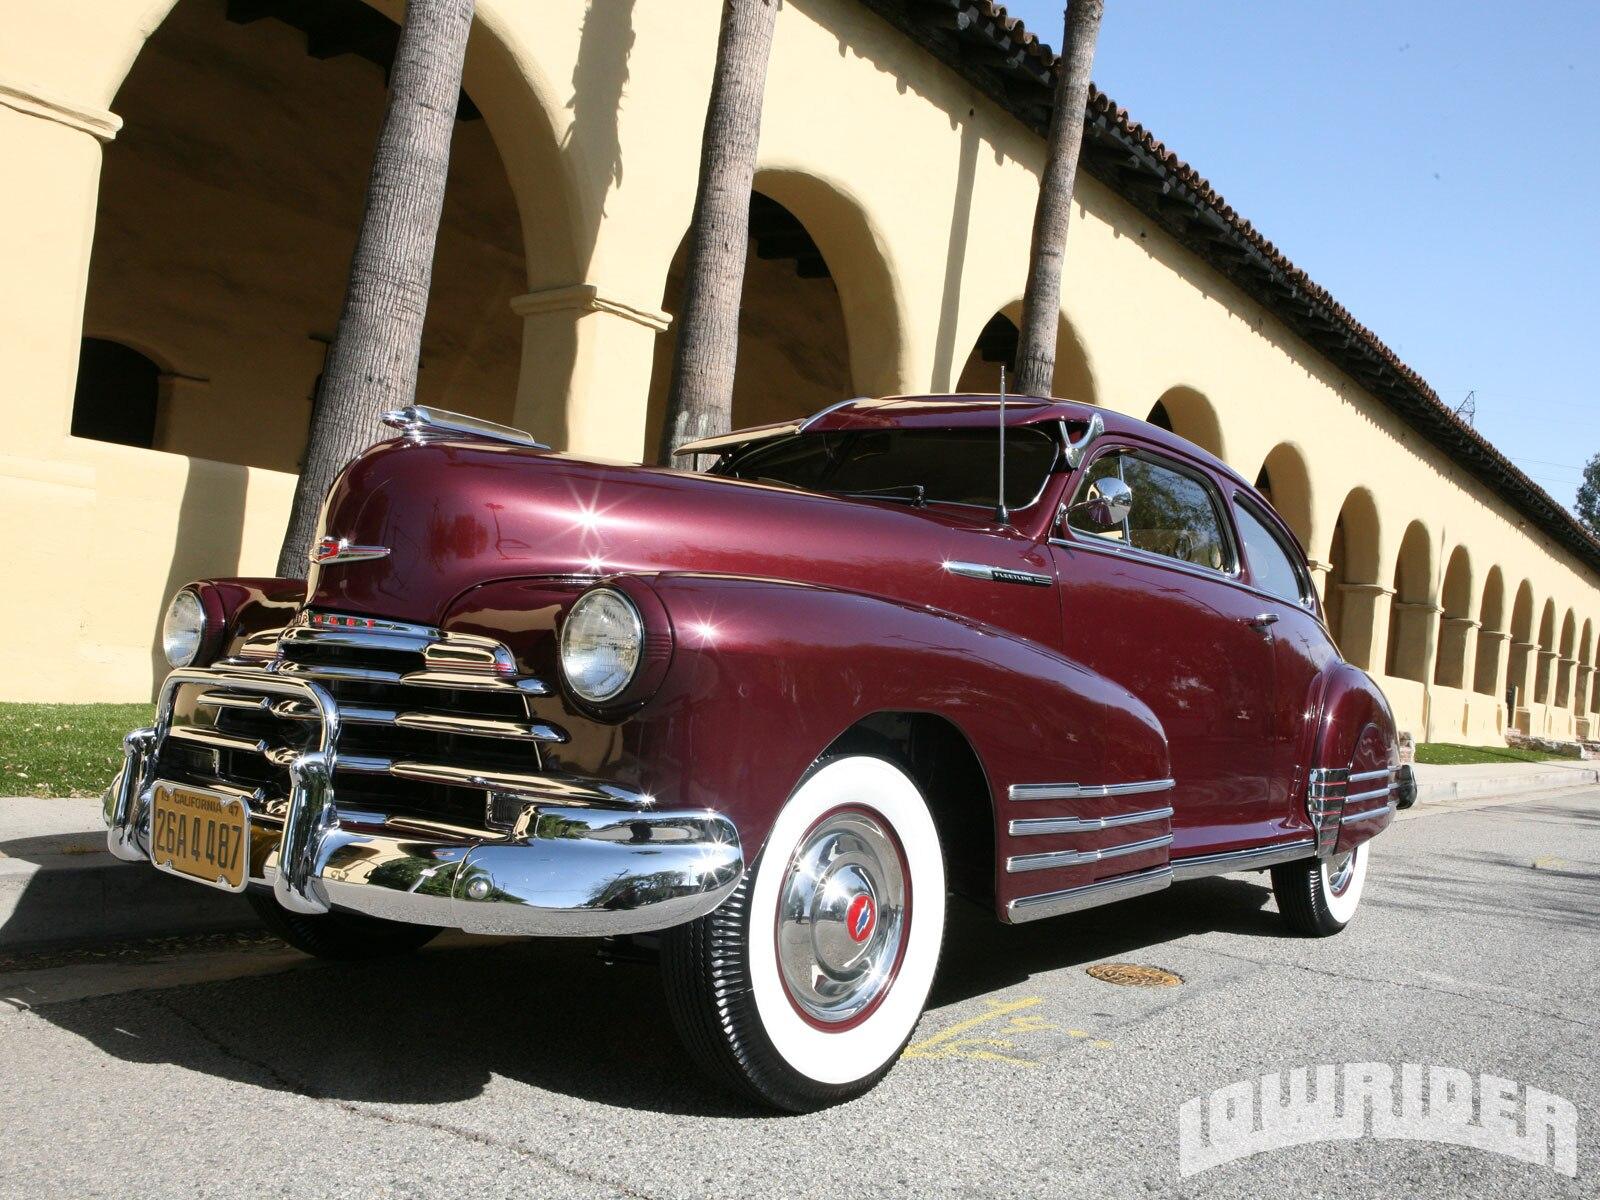 1110-lrmp-13-o-1947-chevrolet-fleetline-driver-side-front-view2